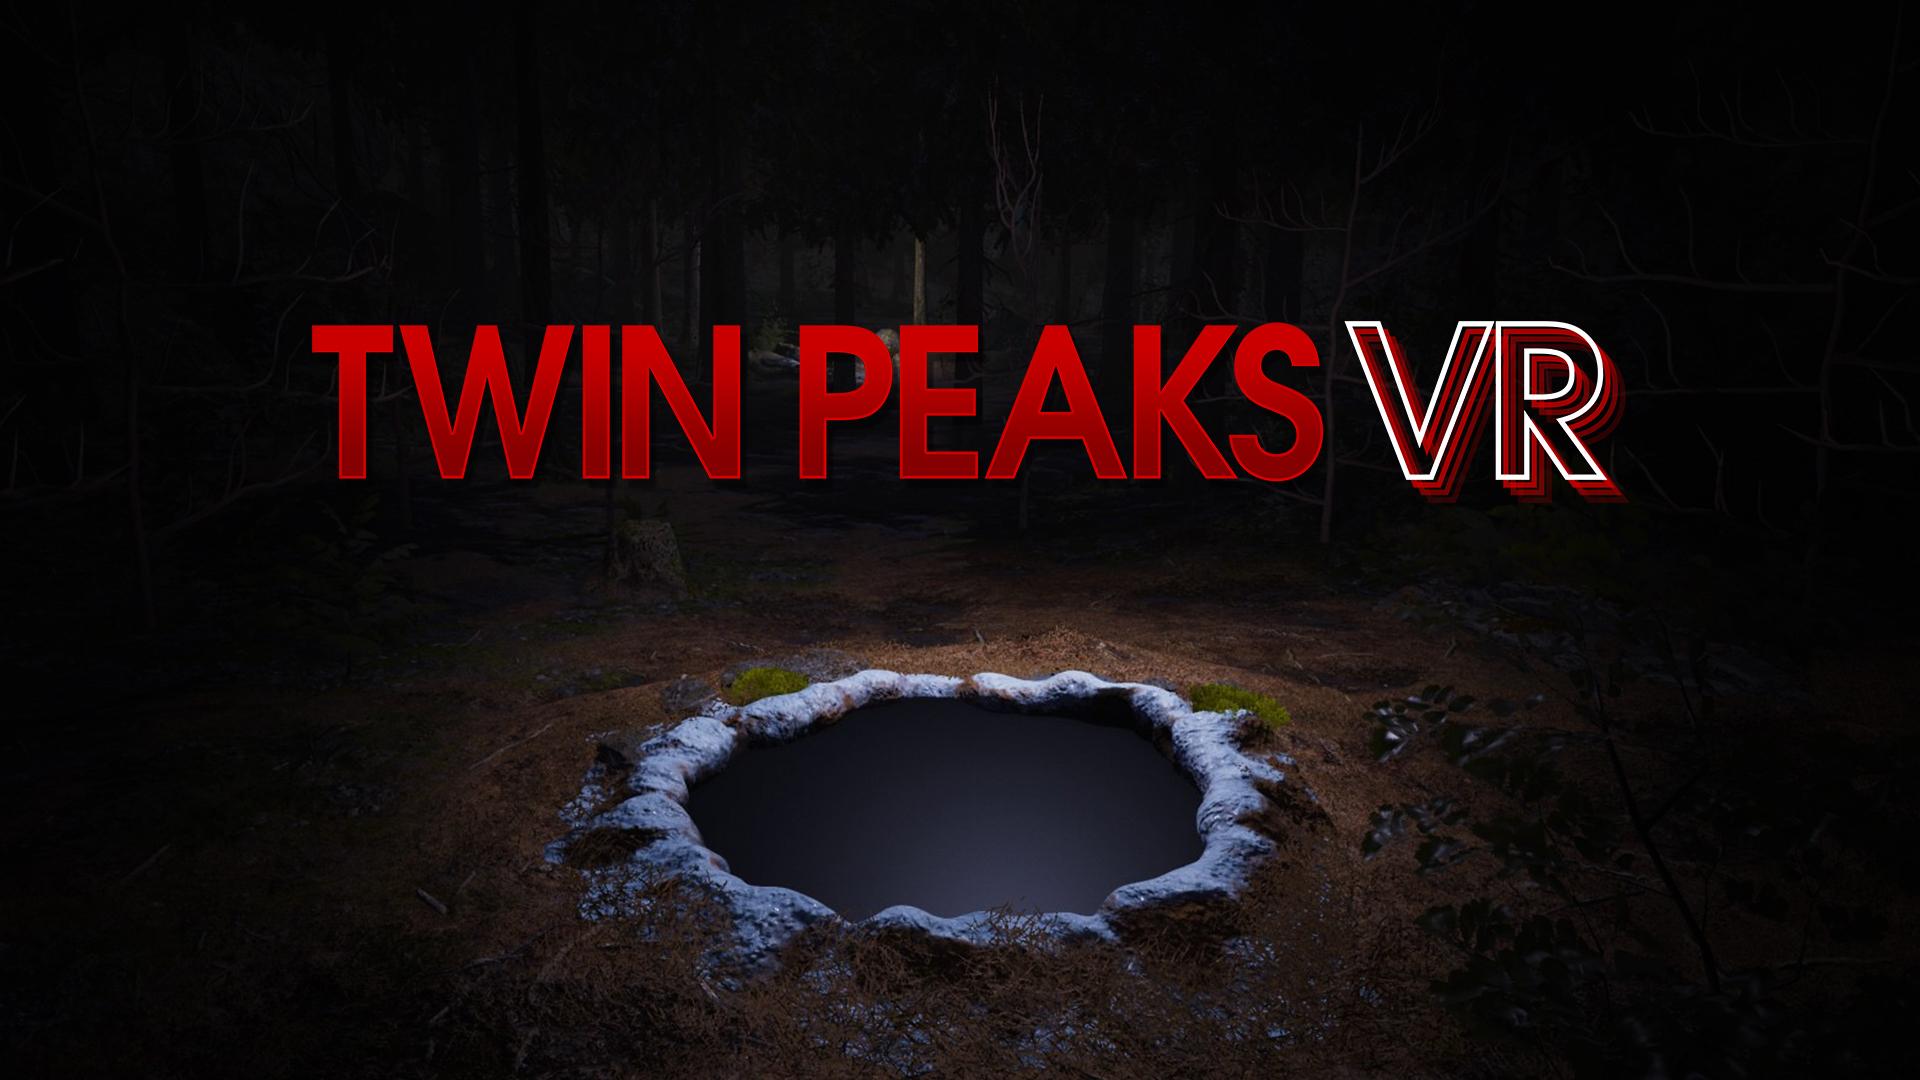 Постер Twin Peaks VR